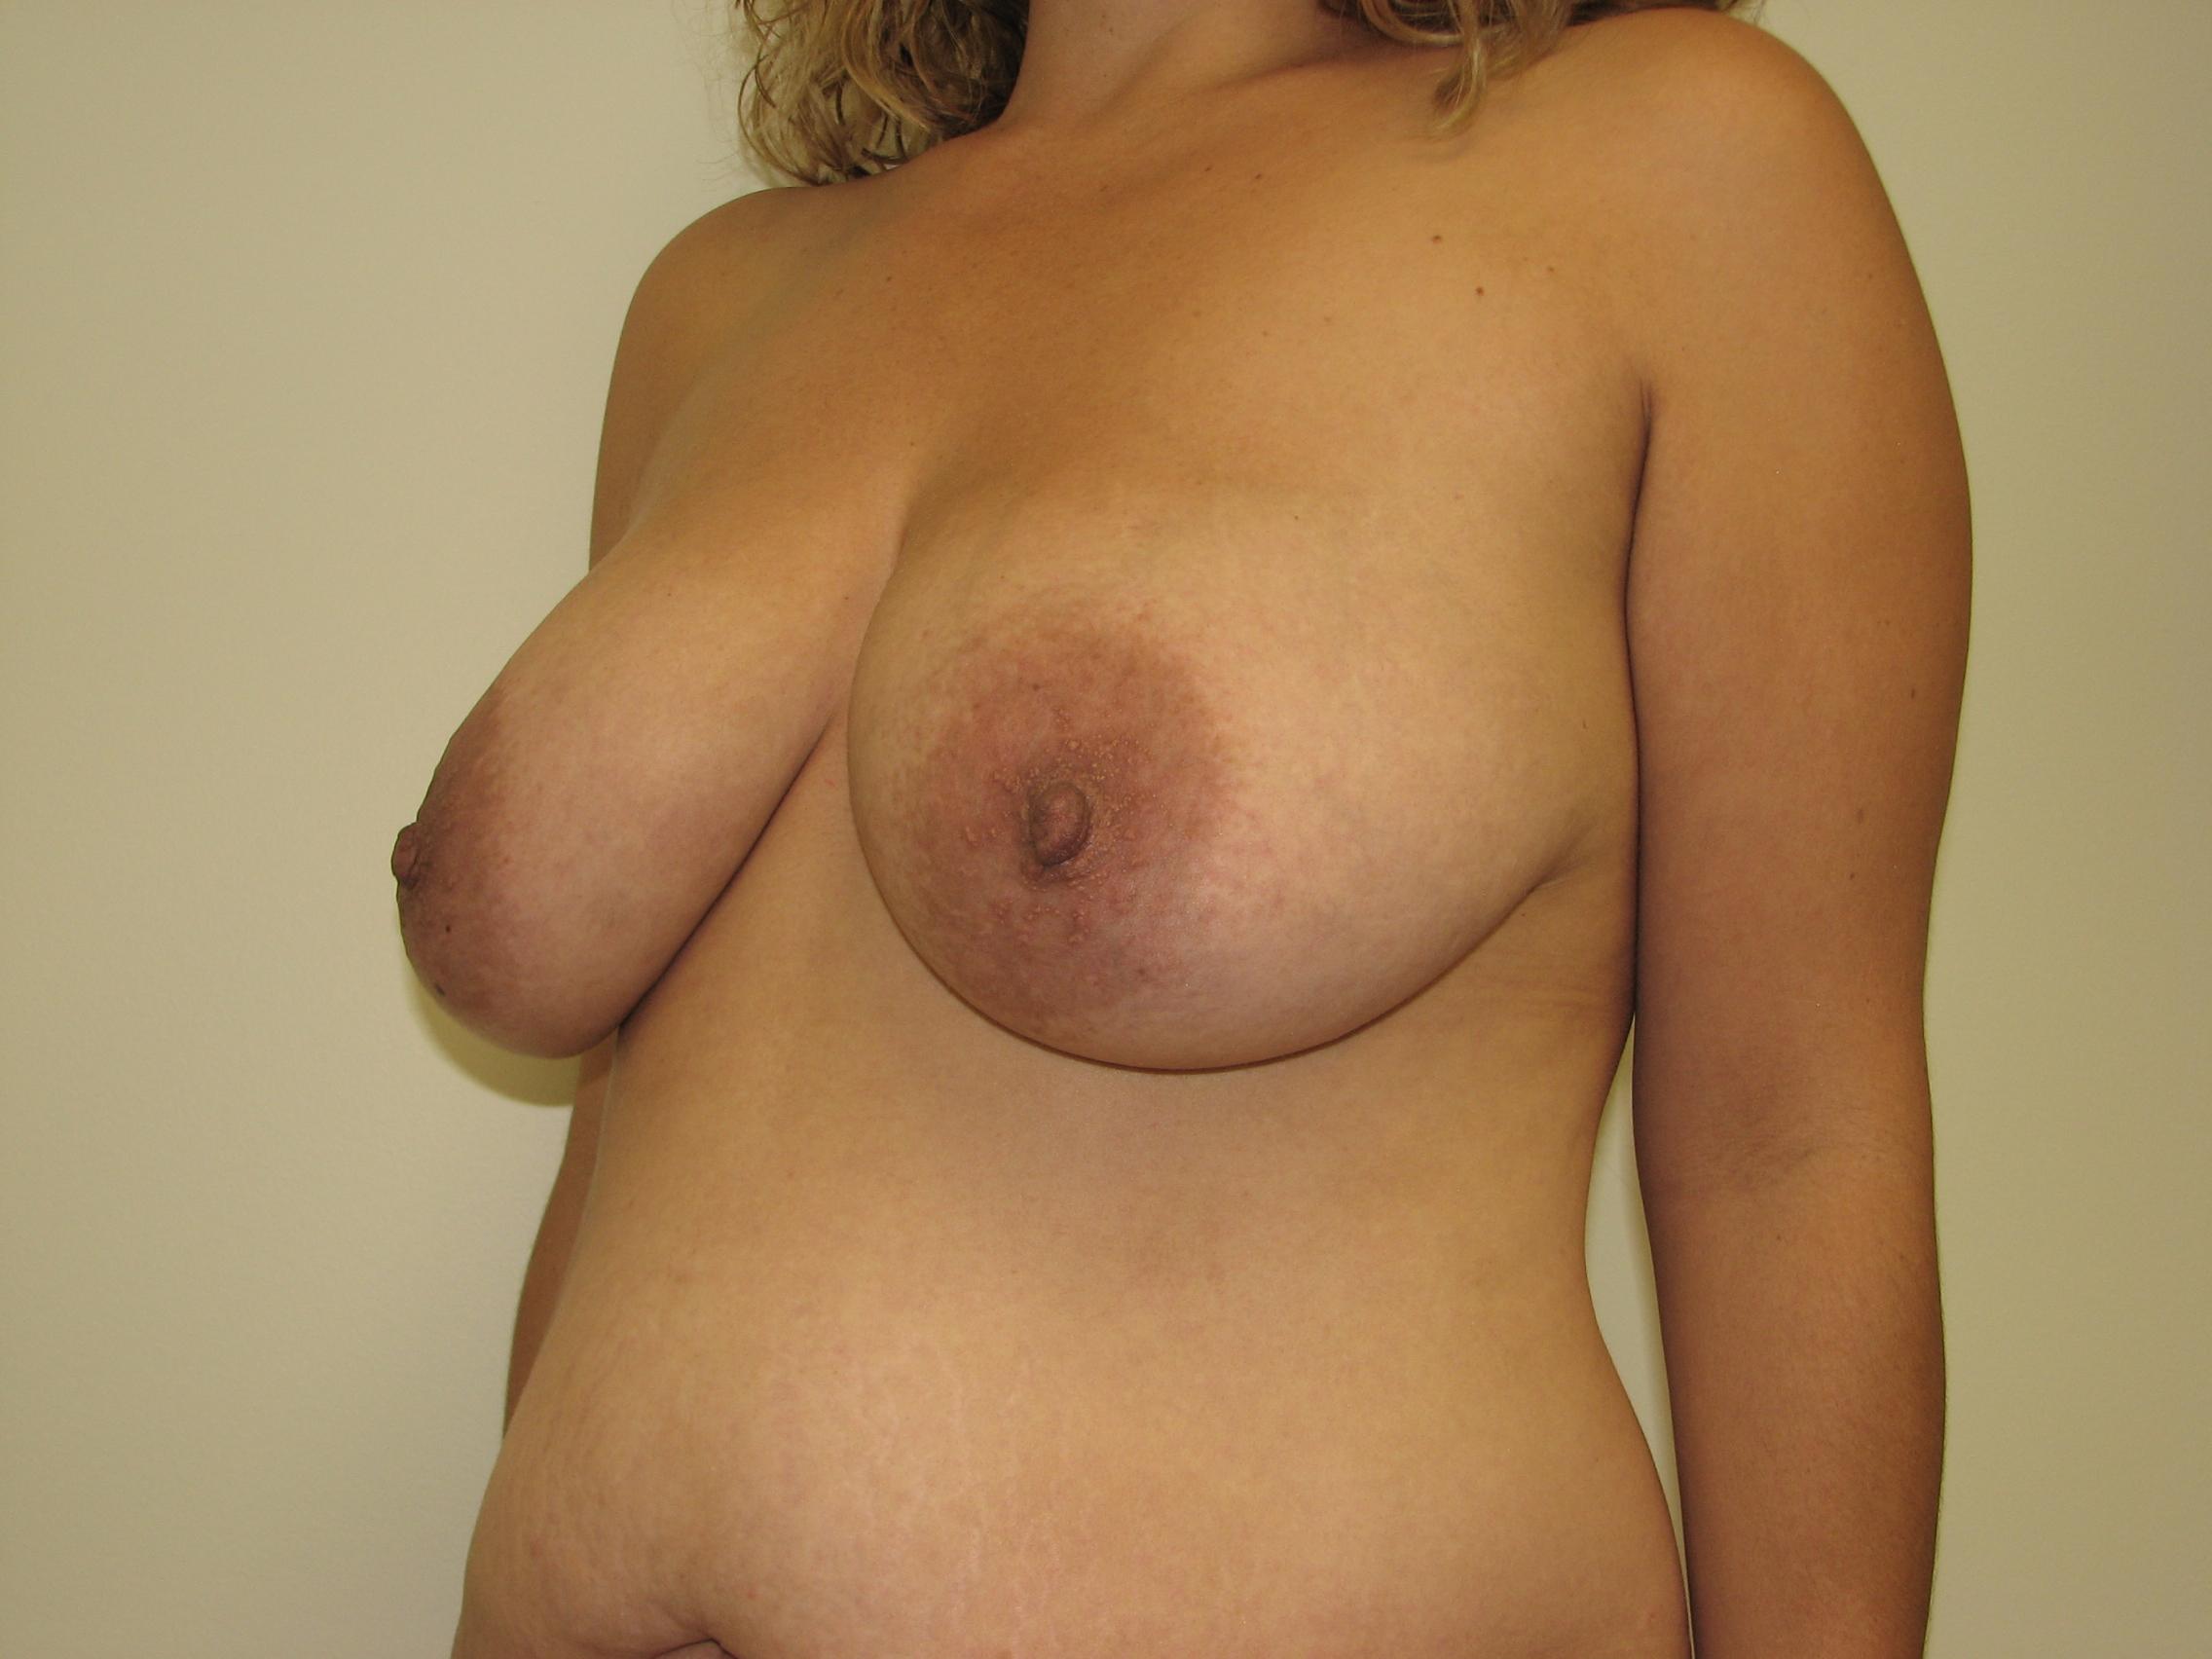 cos breast lift surgery